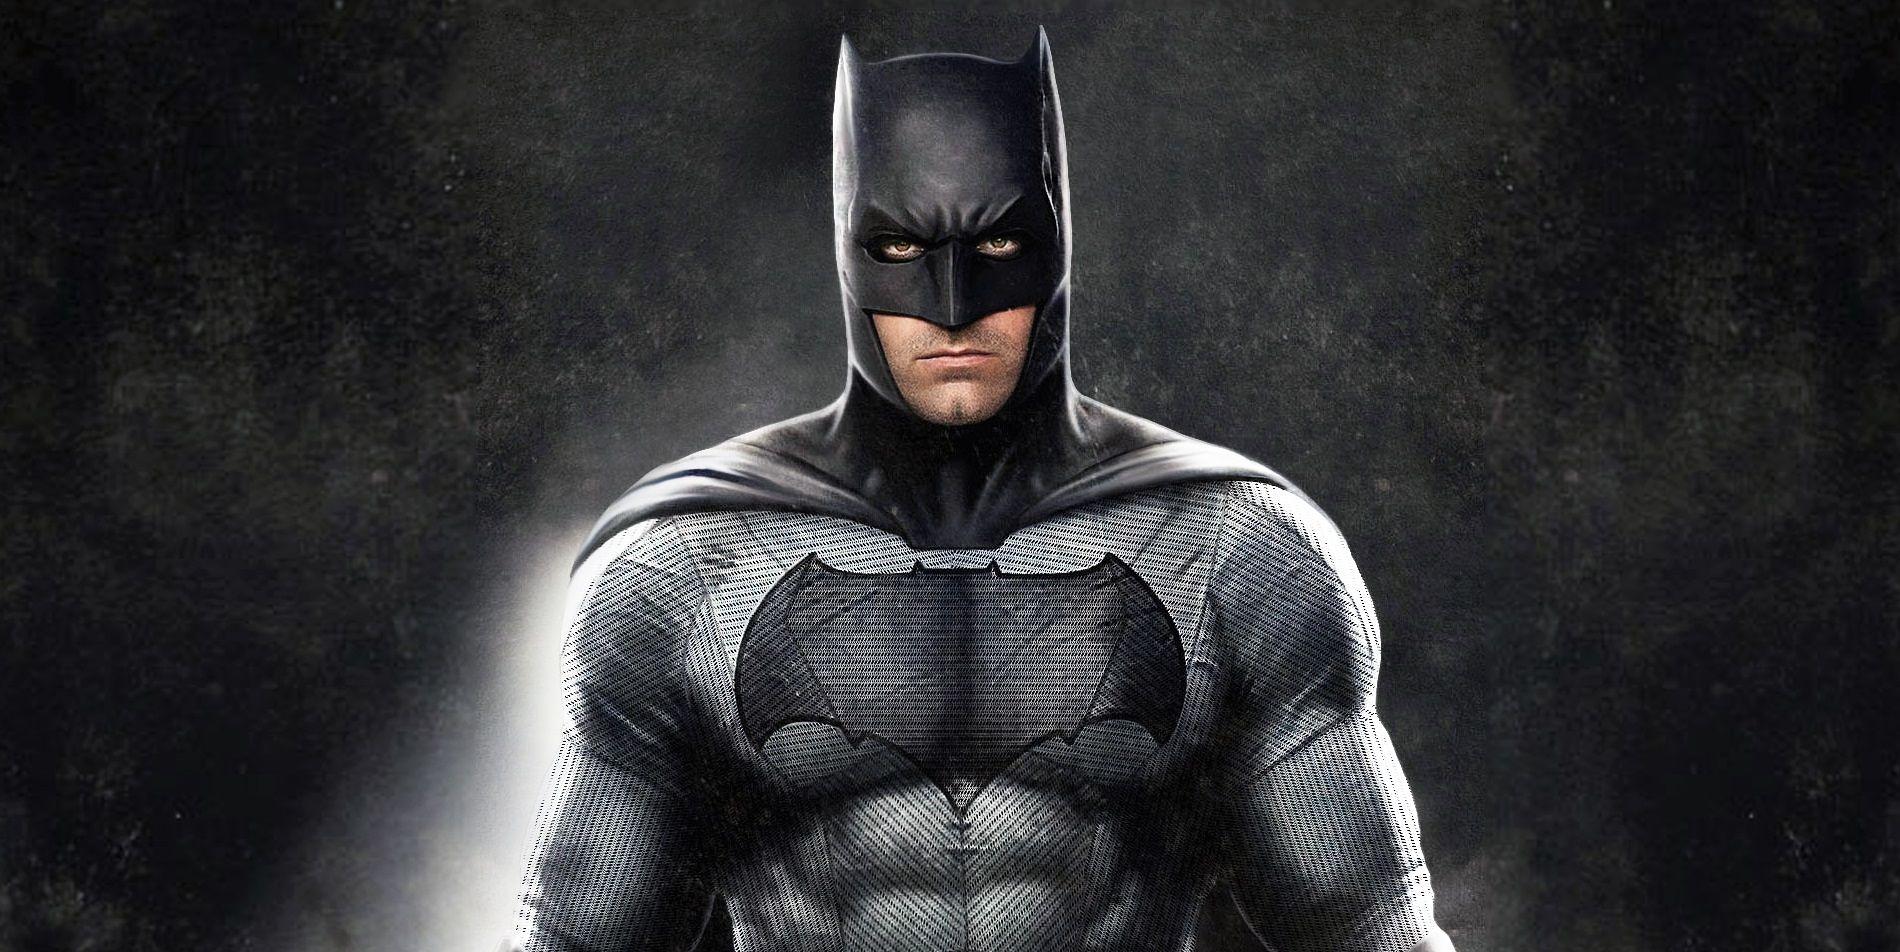 revealed-ben-affleck-s-batman-is-the-biggest-plot-twist-since-darth-vader-as-anakin-skywa-657615